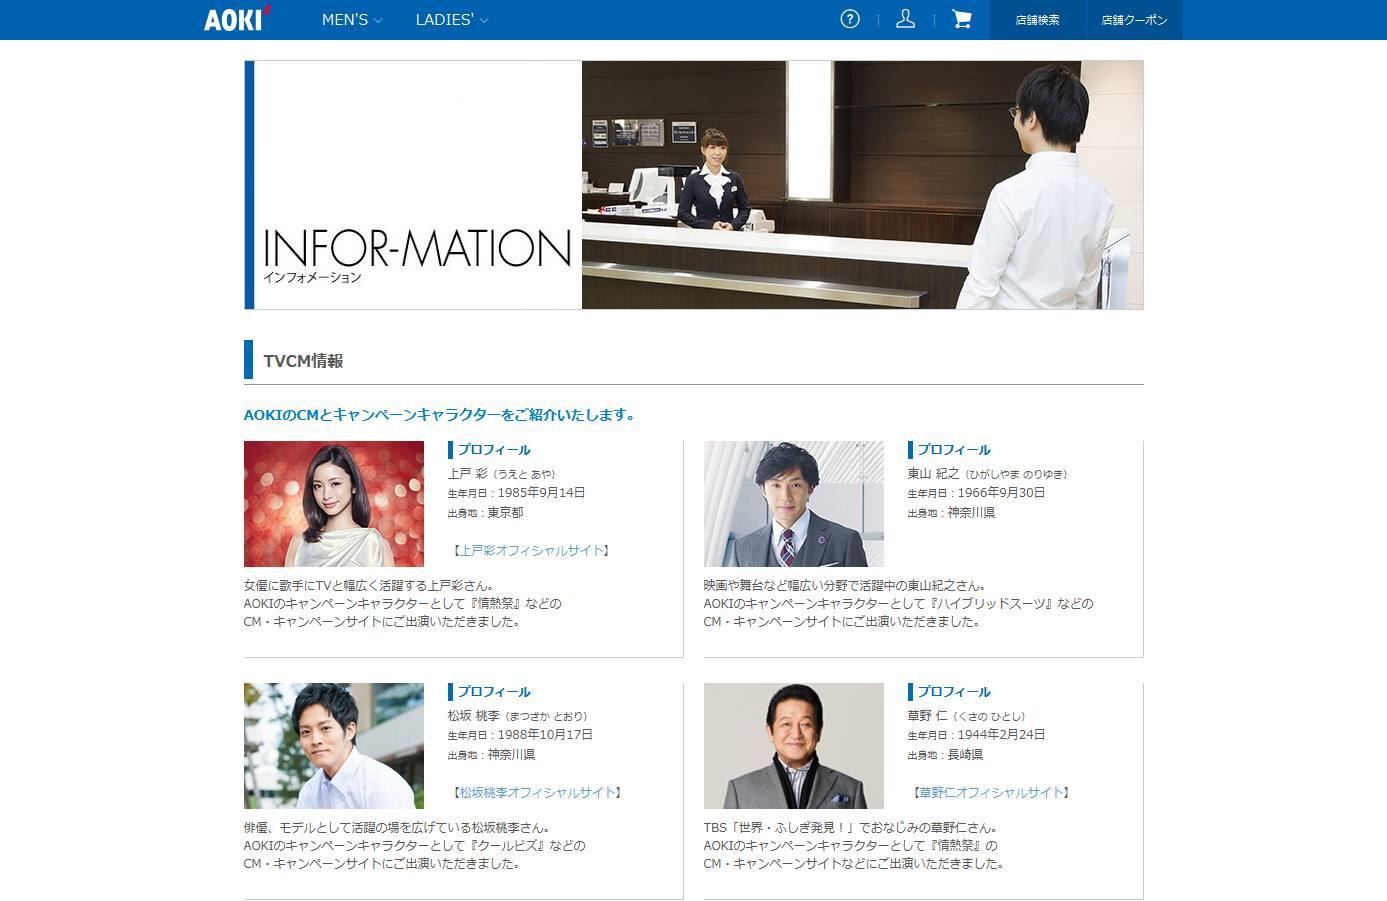 TVCM情報|スーツ・紳士服・礼服・レディースのAOKI